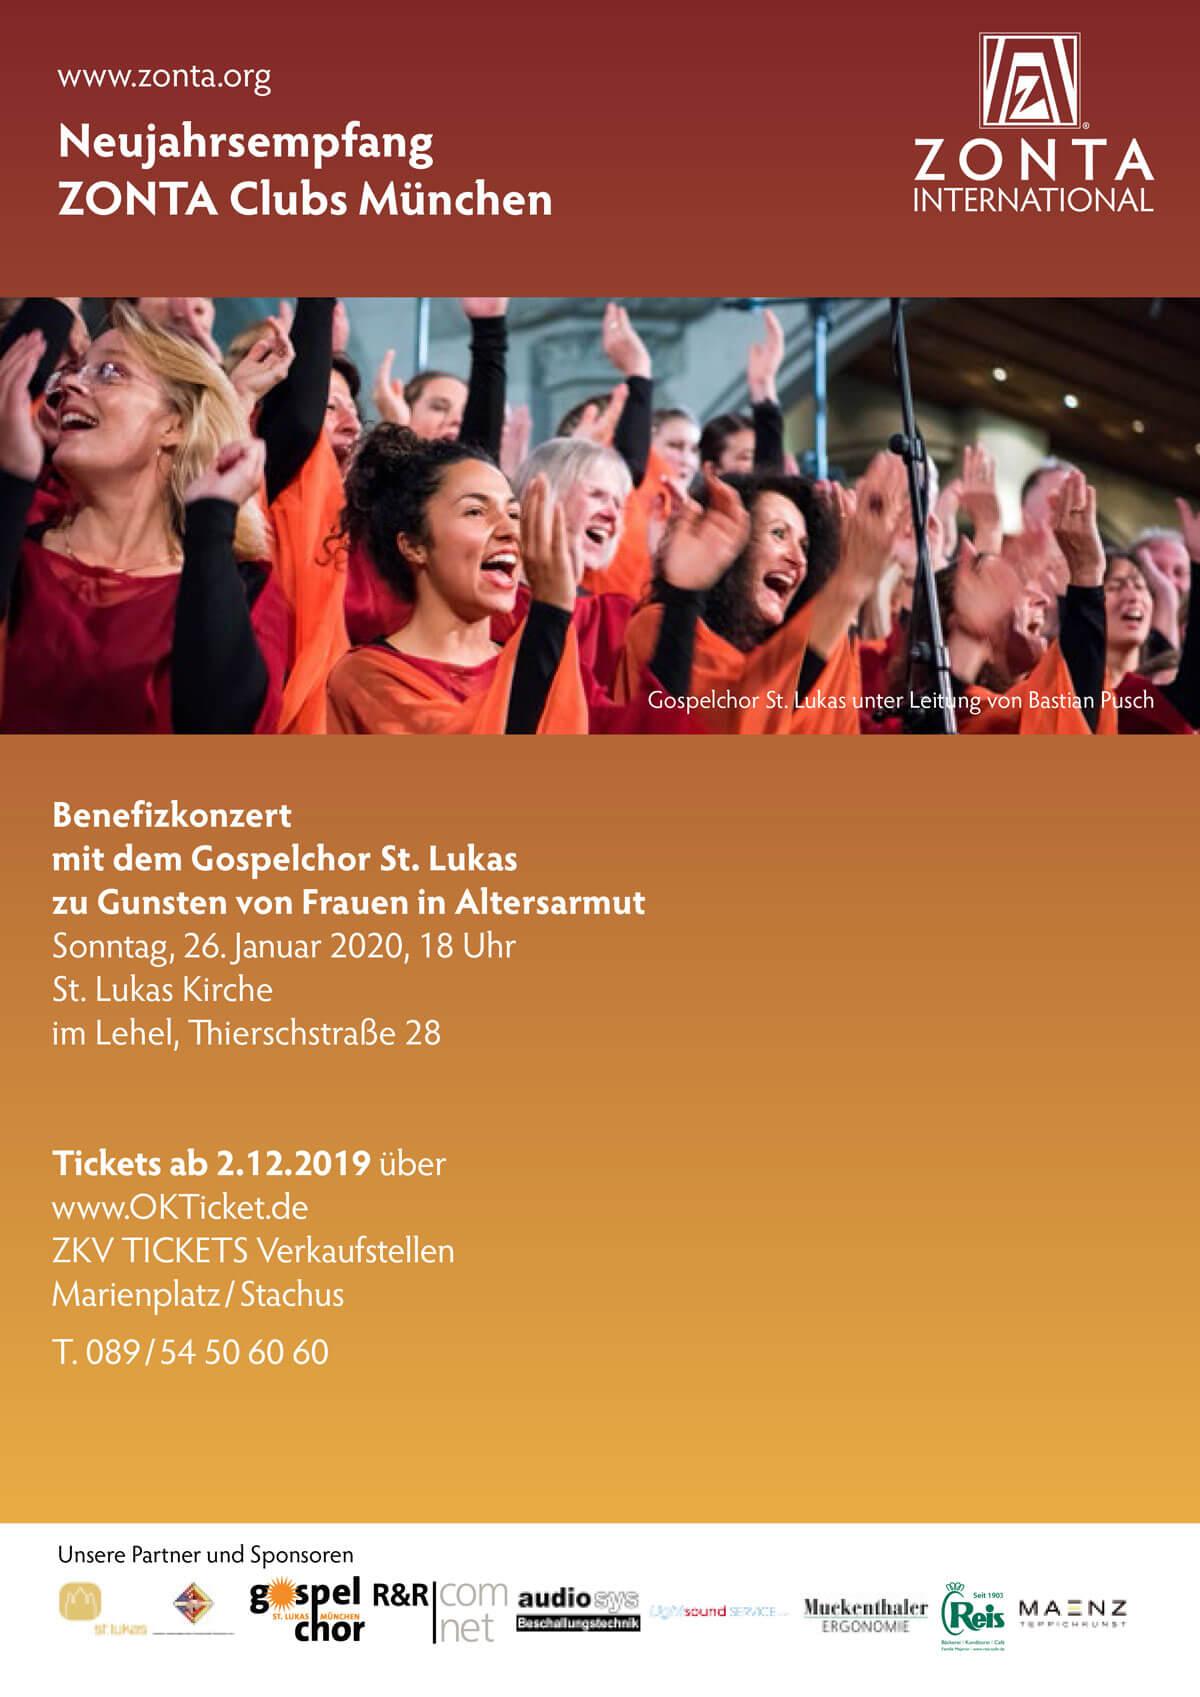 ZONTA München Neujahrsempfang 2020 Plakat